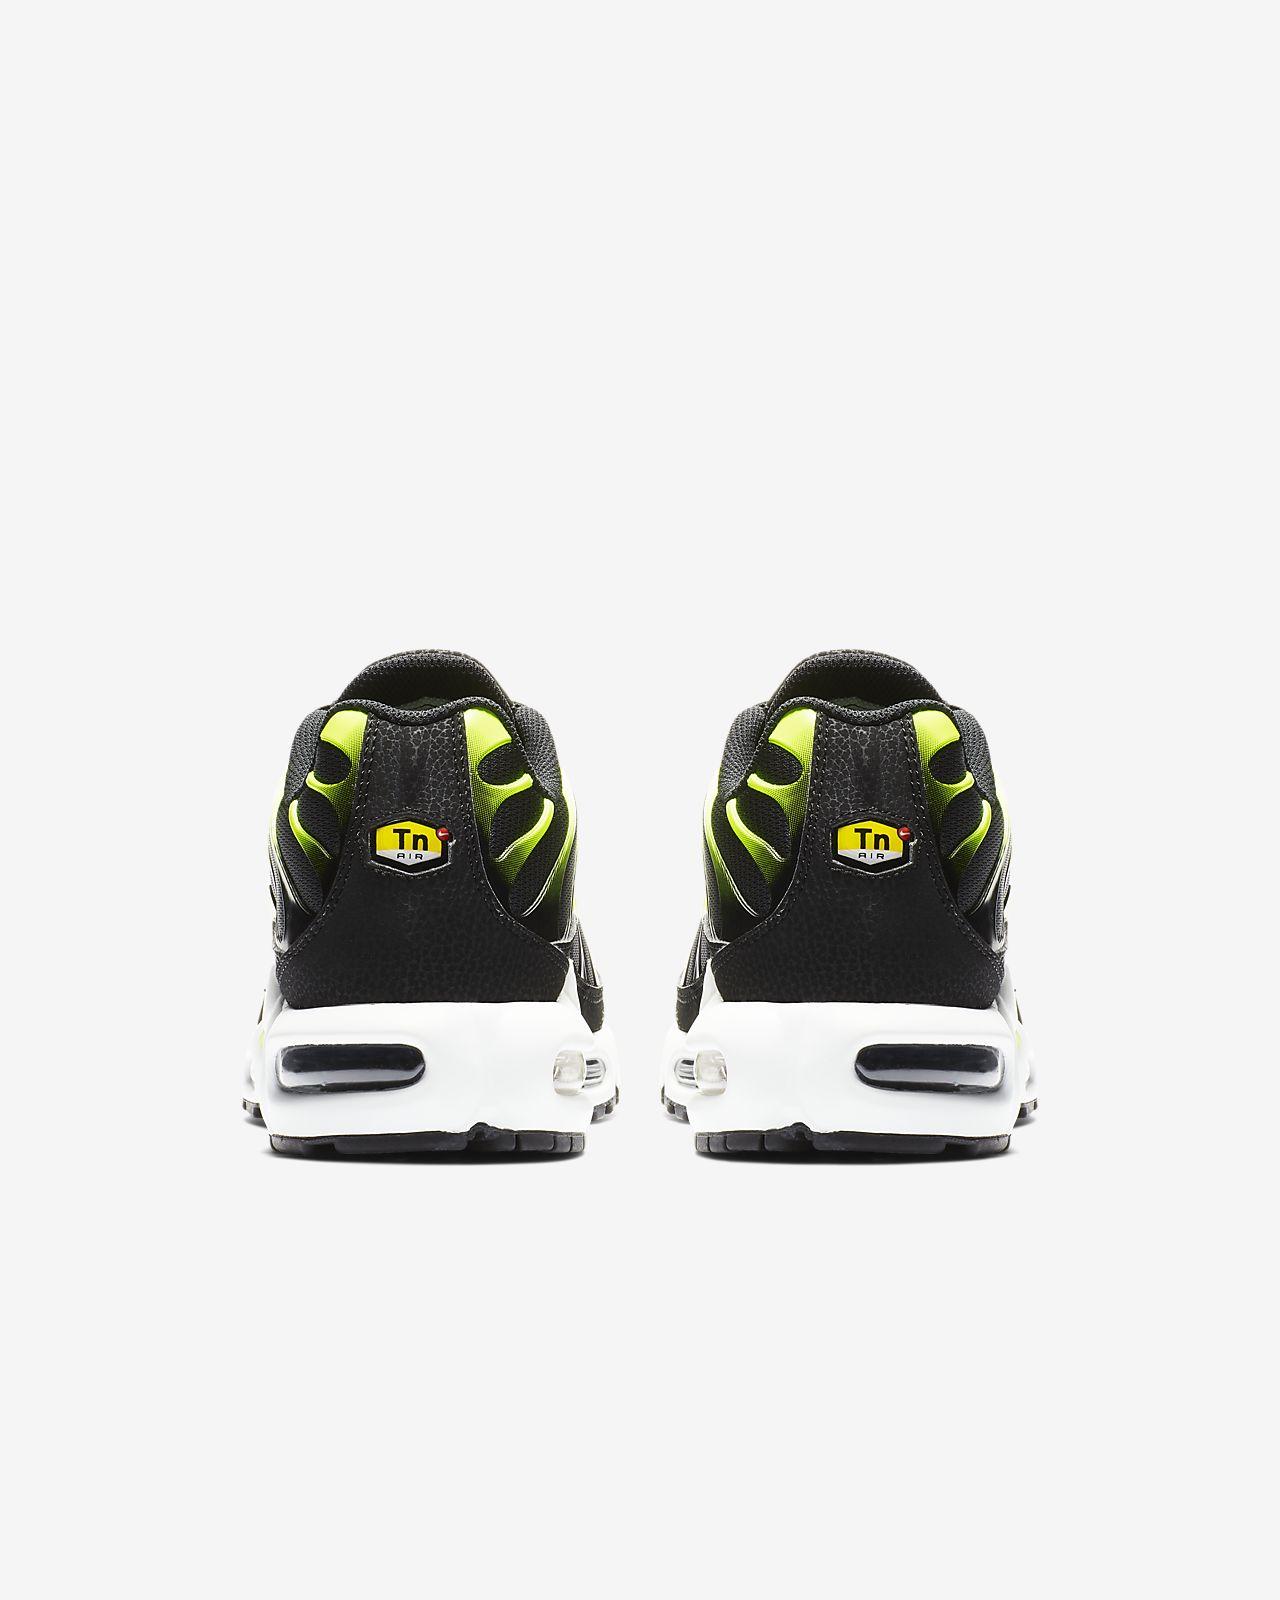 detailed look 39a7a dbee6 ... Nike Air Max Plus Men s Shoe